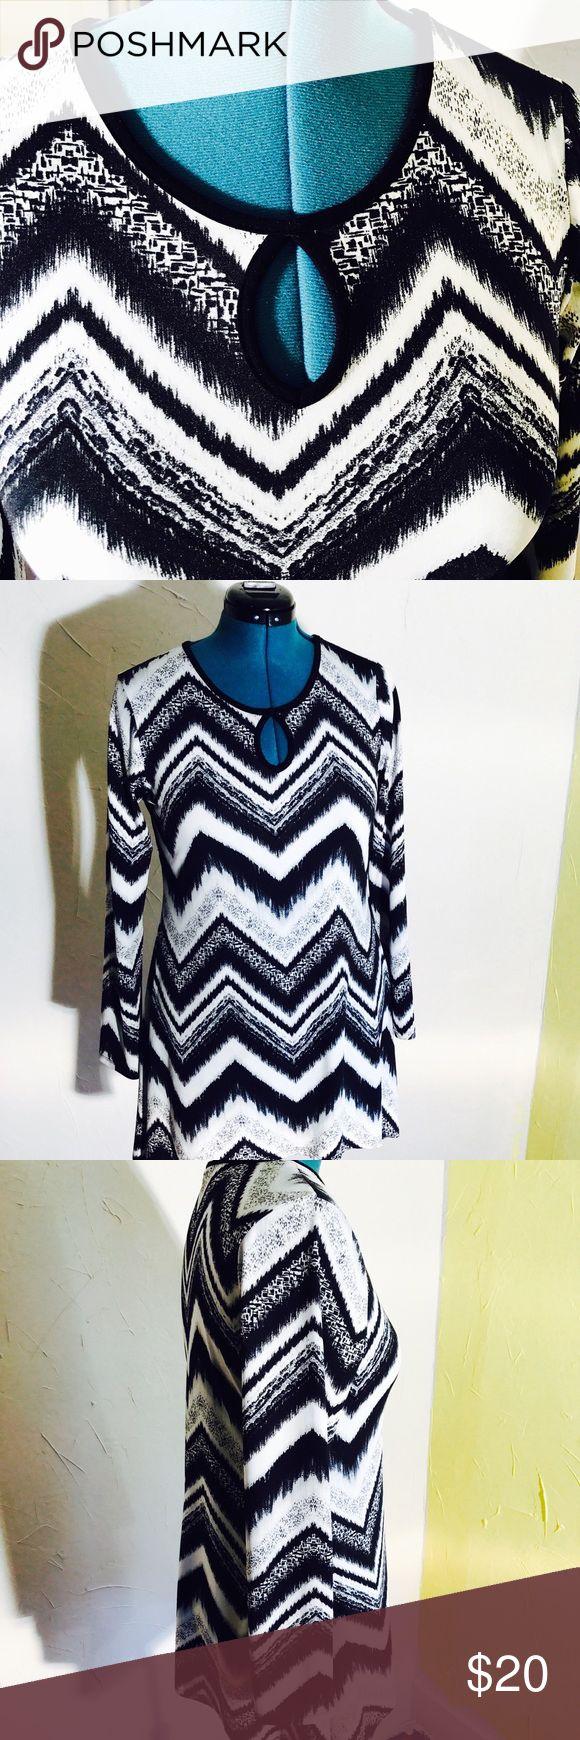 "Chevron print dress tunic Chevron print dress can be worn as tunic.keyhole neckline long sleeve. Size medium length 34""/chest 22""/shoulder 15""/waist 18""/Hip 24""/bottom width 37""/sleeve length 24"" faith and joy Dresses Mini"